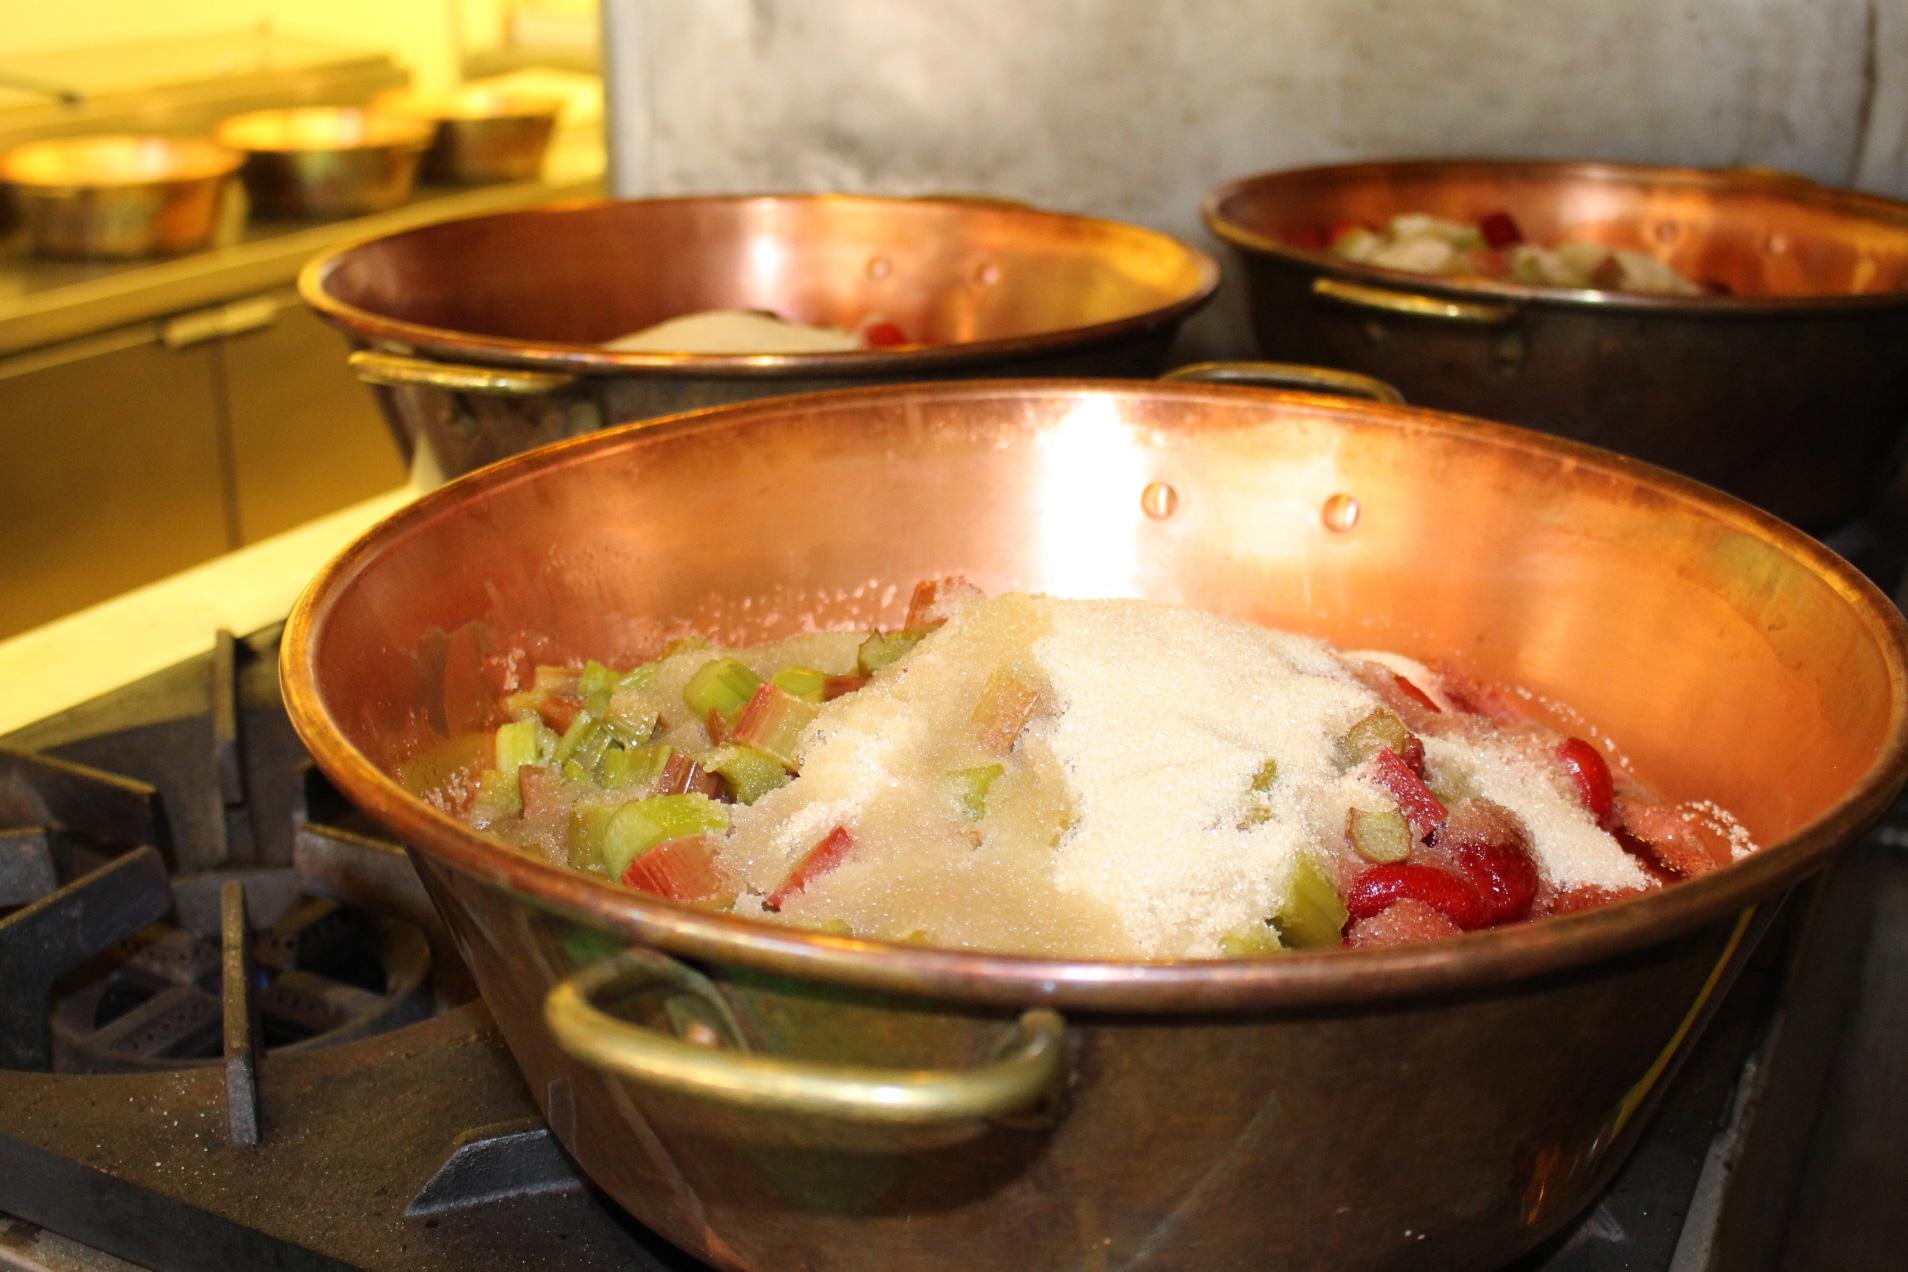 making jam in a pot